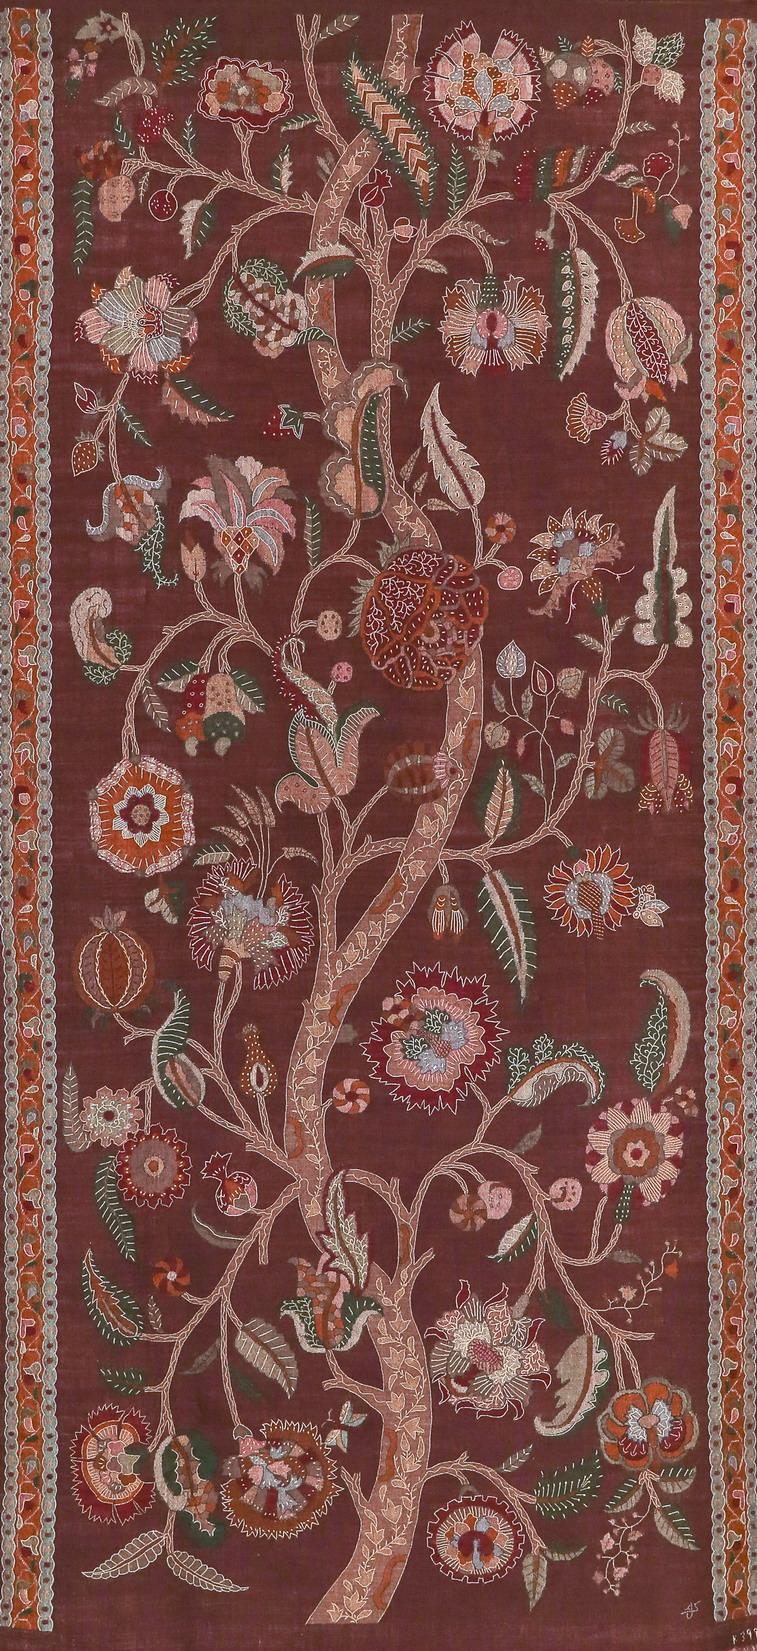 08 印度喀什米爾傳統羊絨織品(Contemporary collection, cashmere Panel, INDIA)